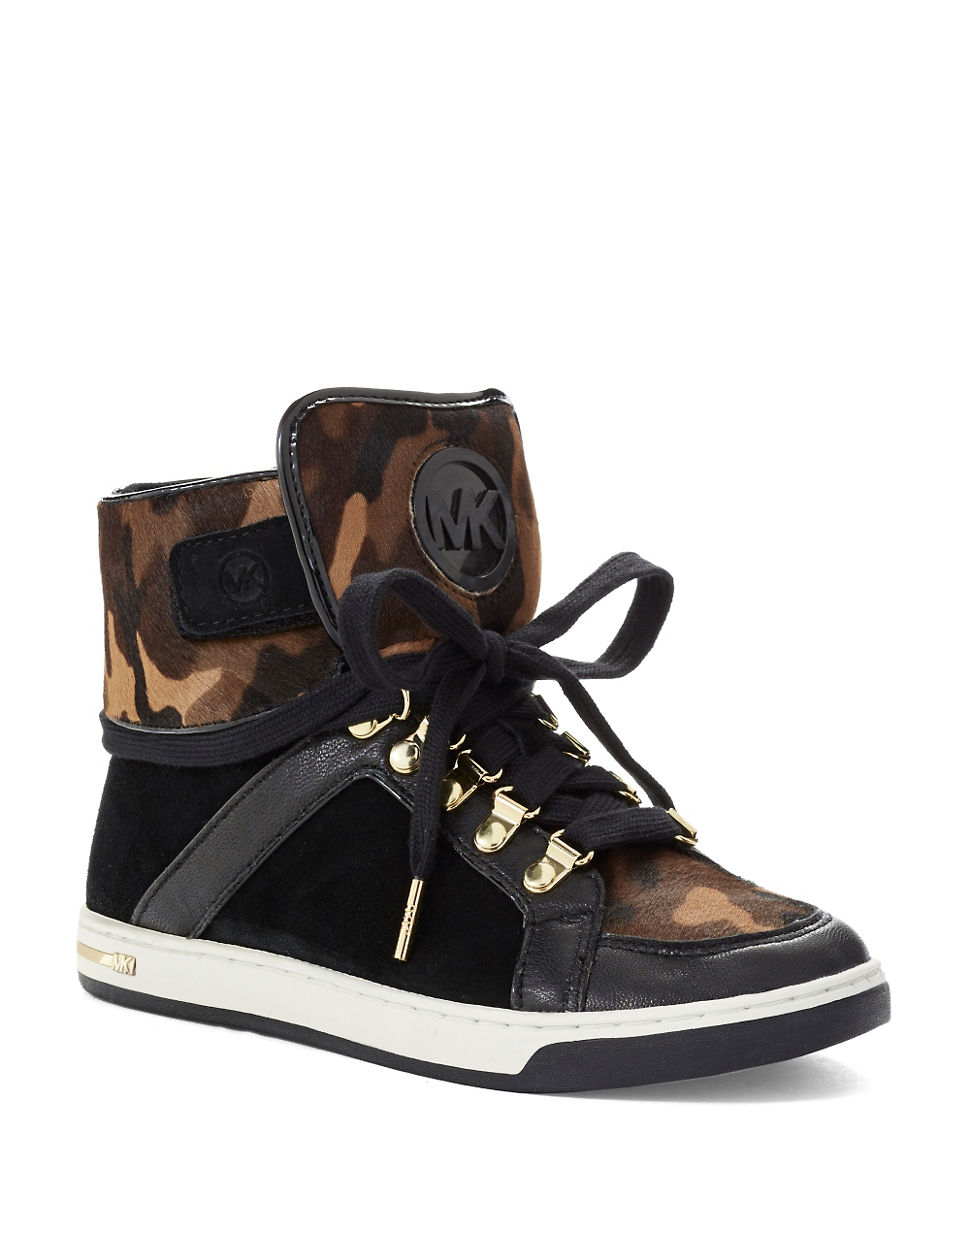 michael kors sneaker high michael kors essex studded. Black Bedroom Furniture Sets. Home Design Ideas